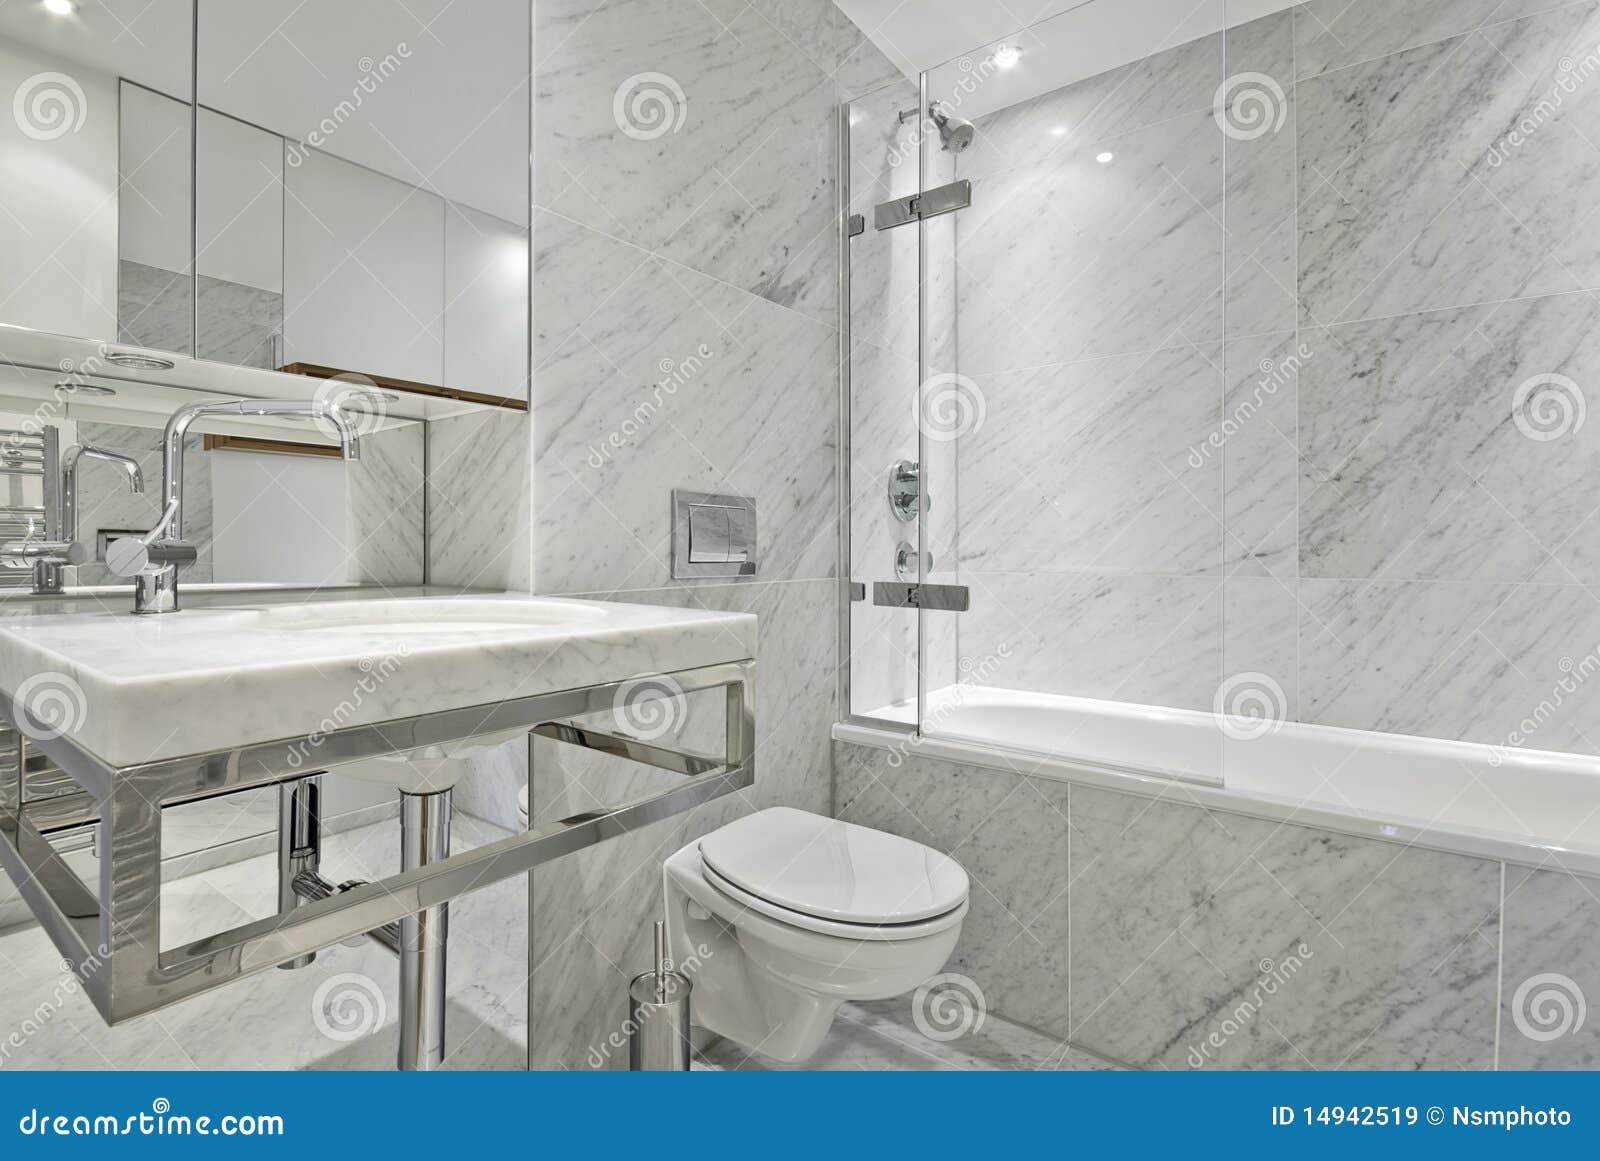 Badkamer Interieur Ideeen ~ Moderne Engelse Reeks Marmeren Badkamers In Wit Royalty vrije Stock